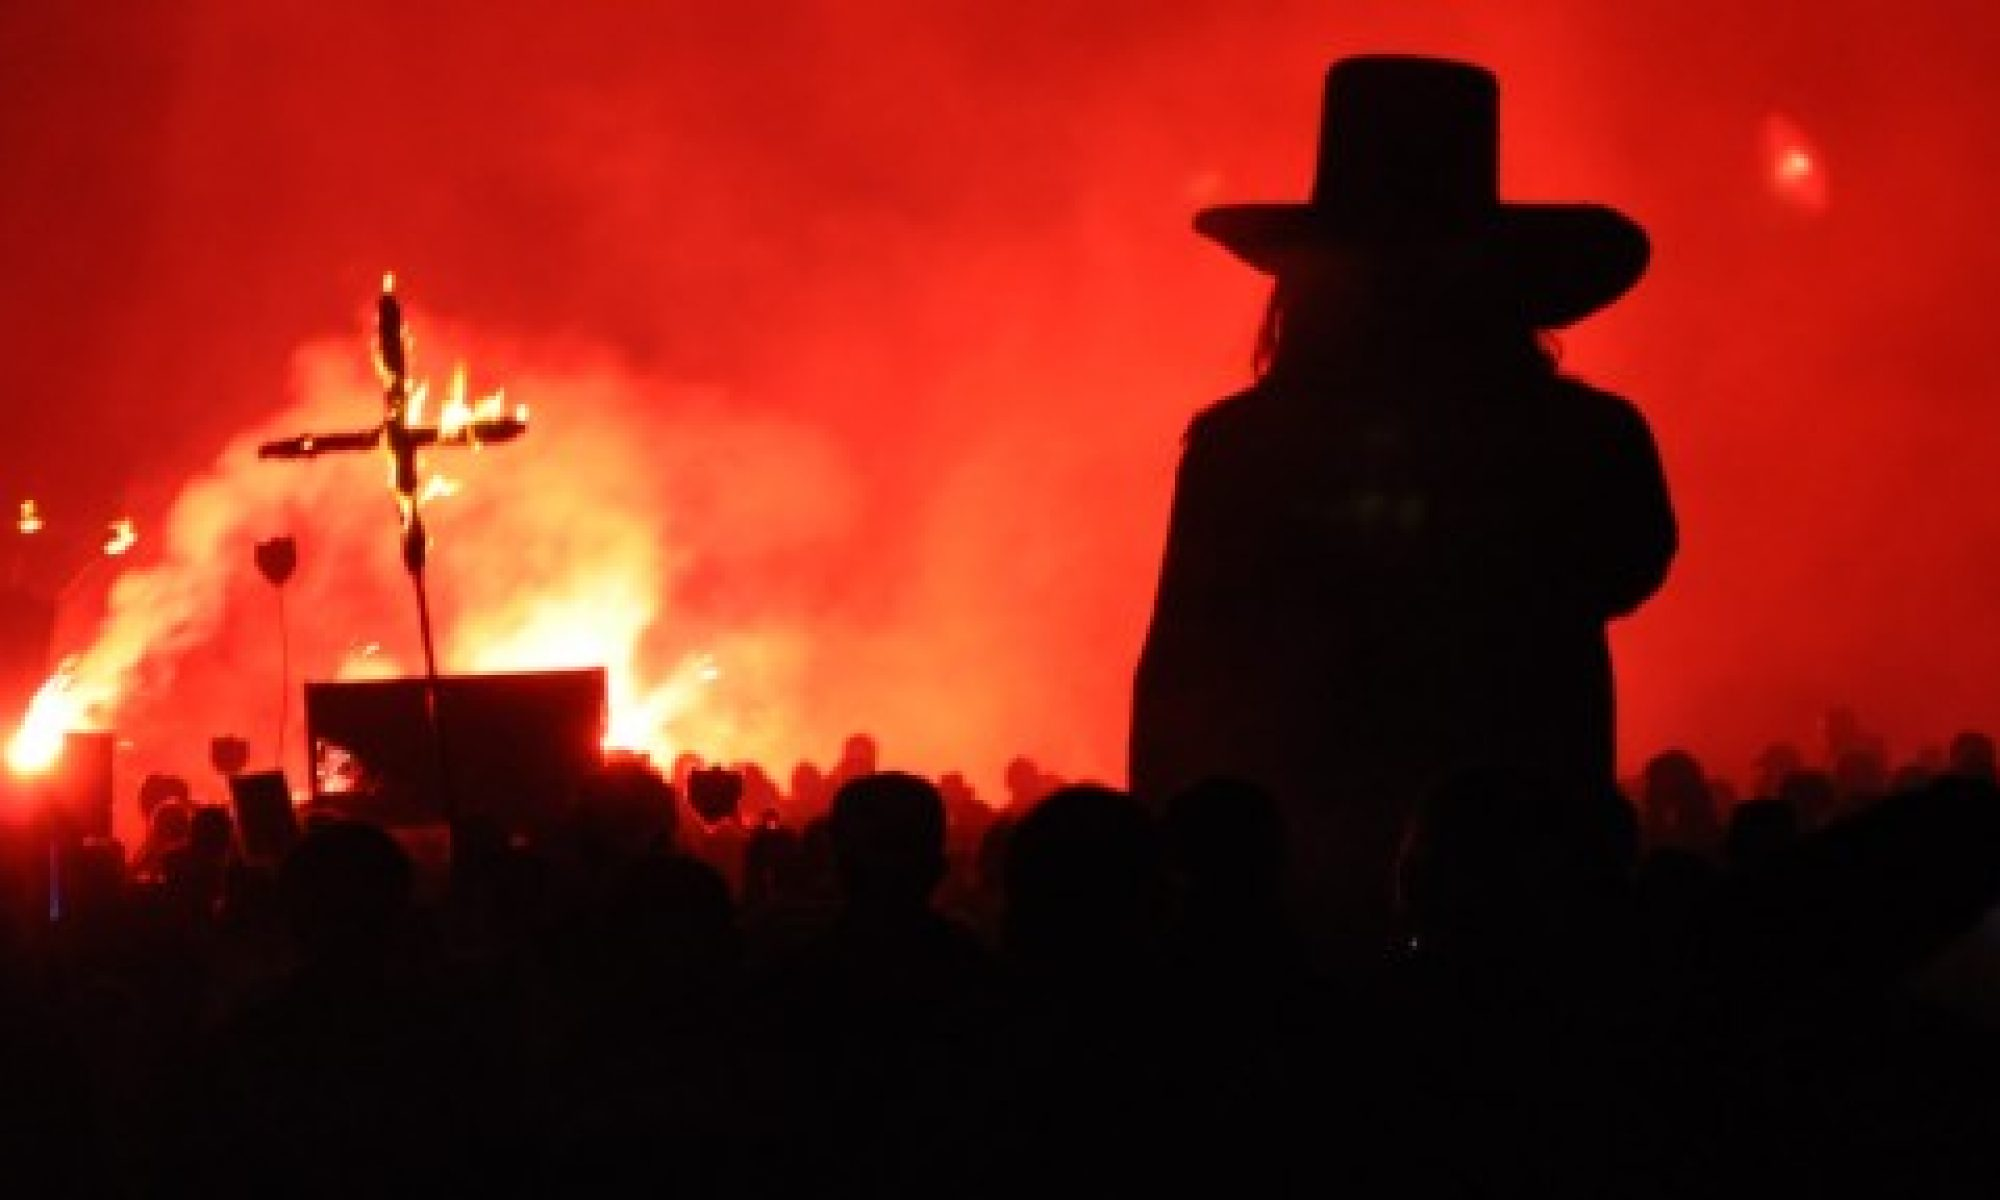 Lindfield Bonfire Society